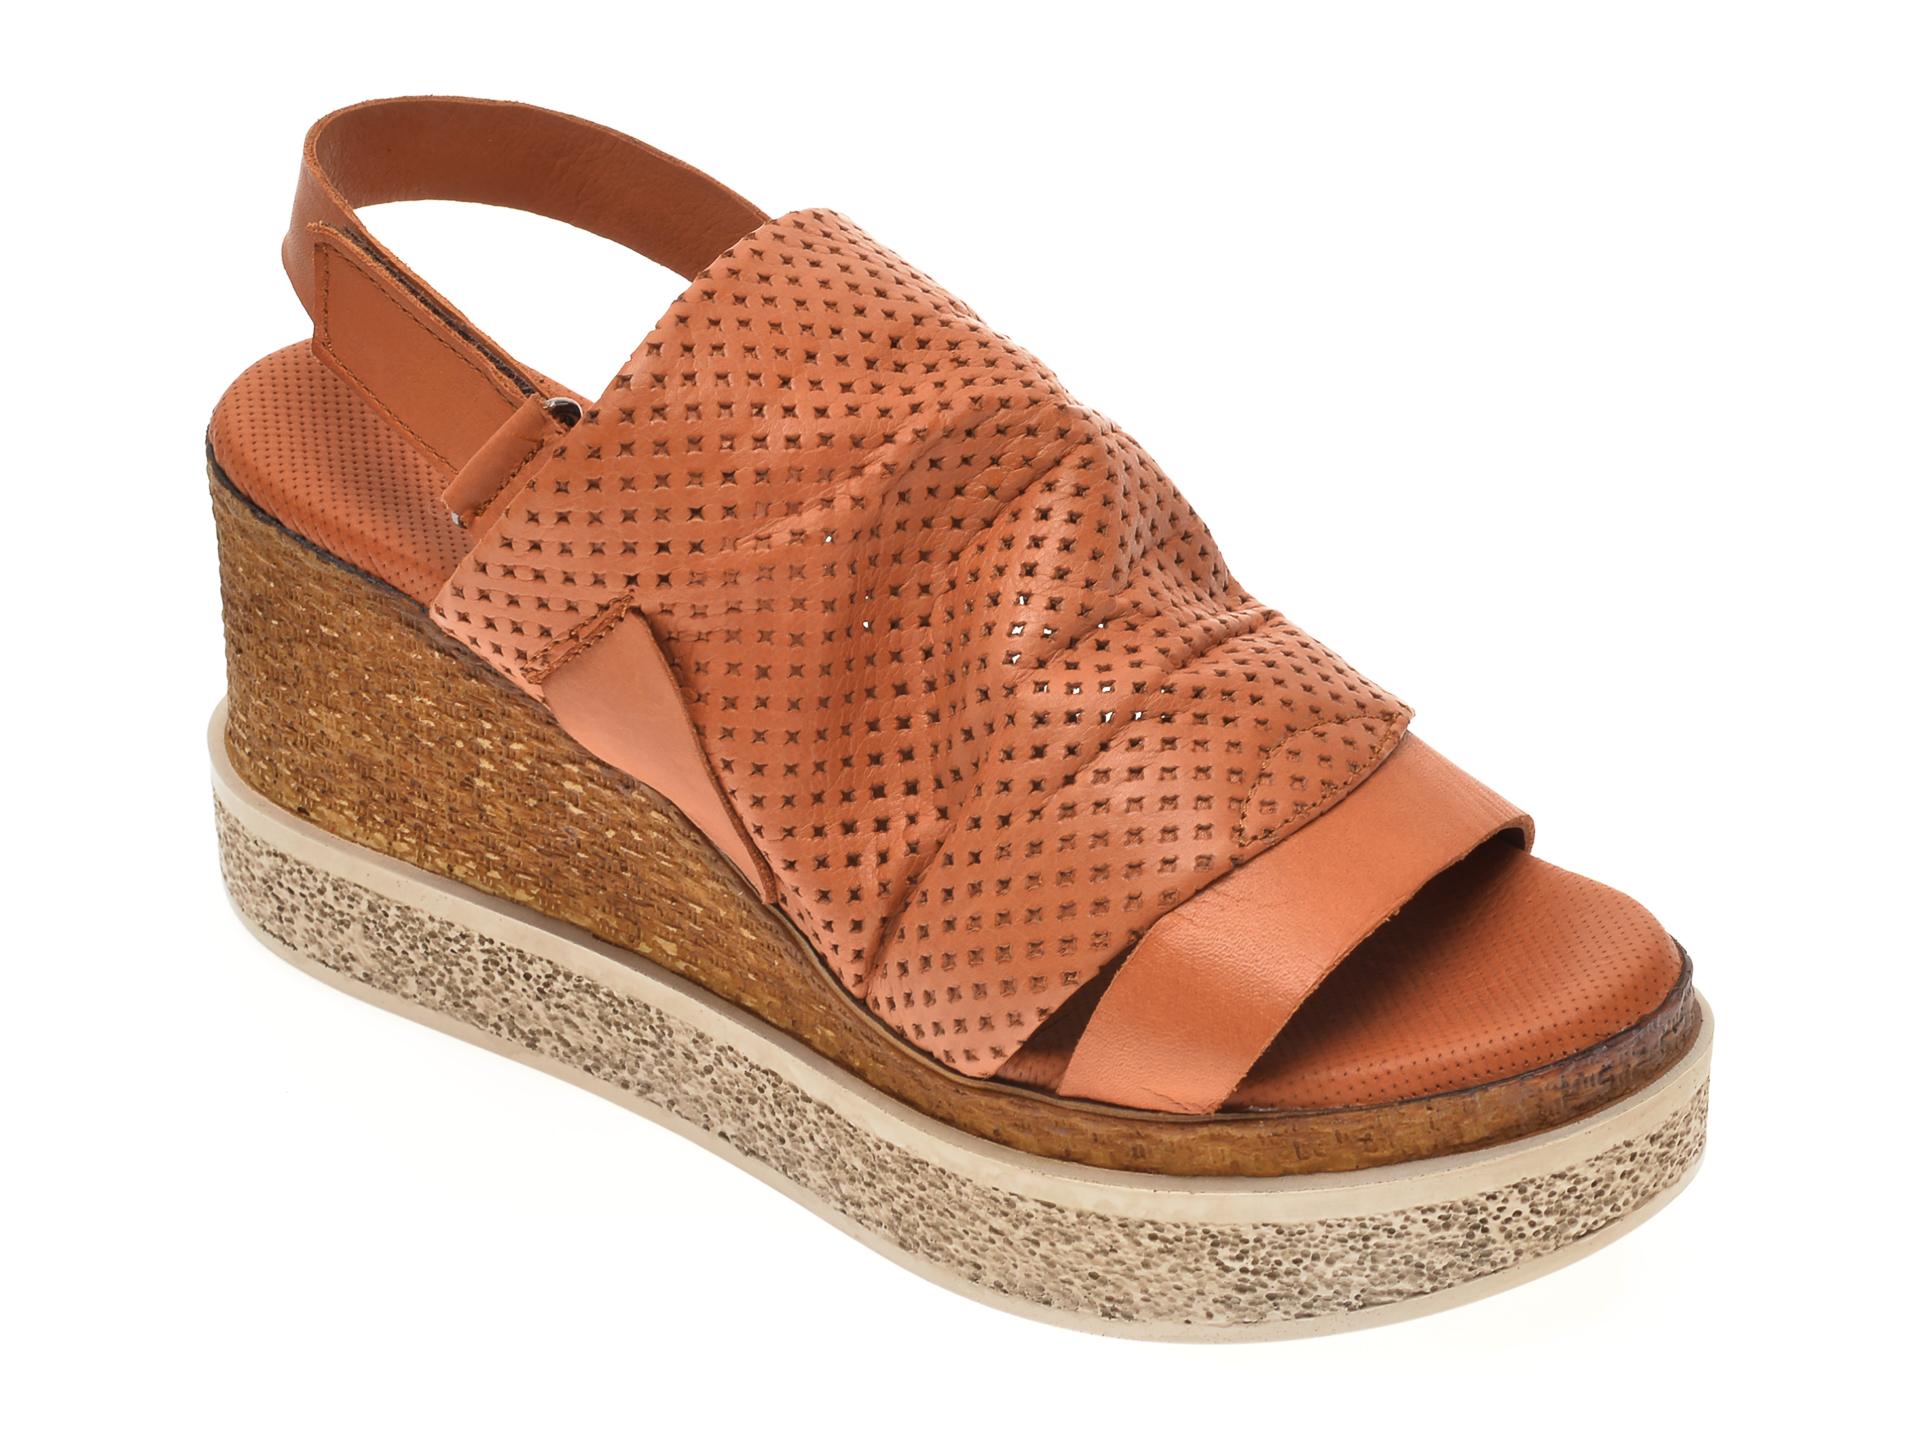 Sandale BABOOS maro, 852507, din piele naturala imagine